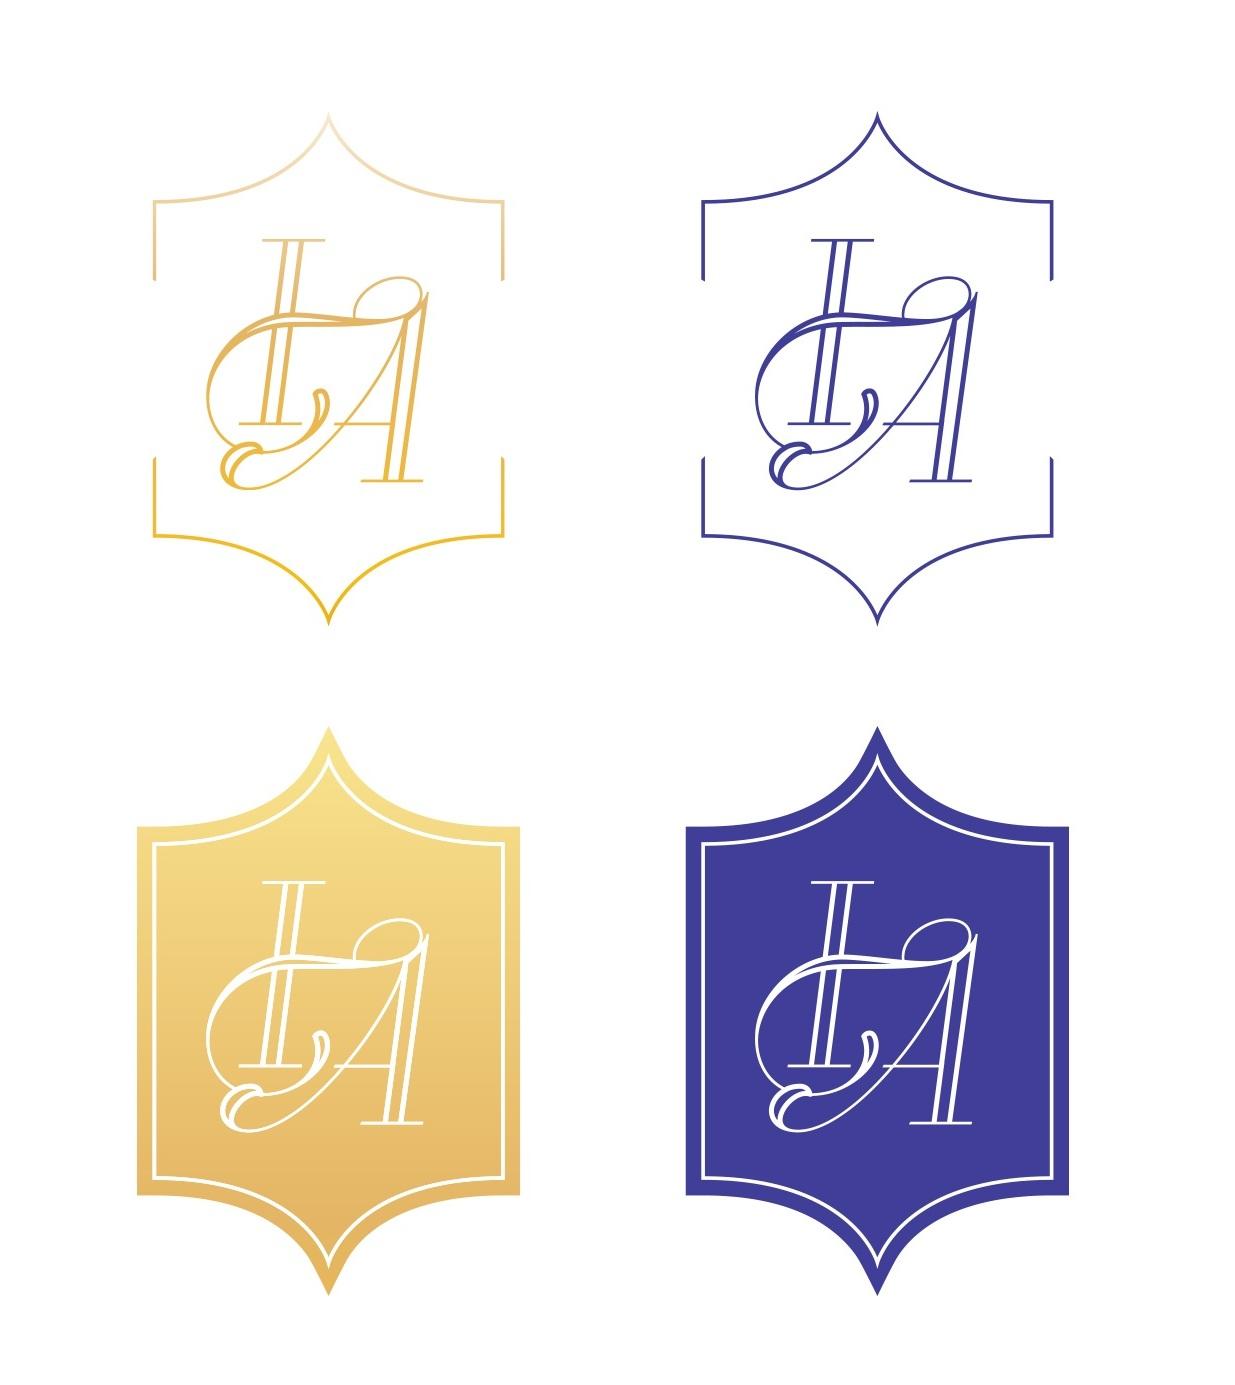 Tarva%2BDesign%2BStudio_The%2Bitinerary%2BArtists_Emblems.jpg